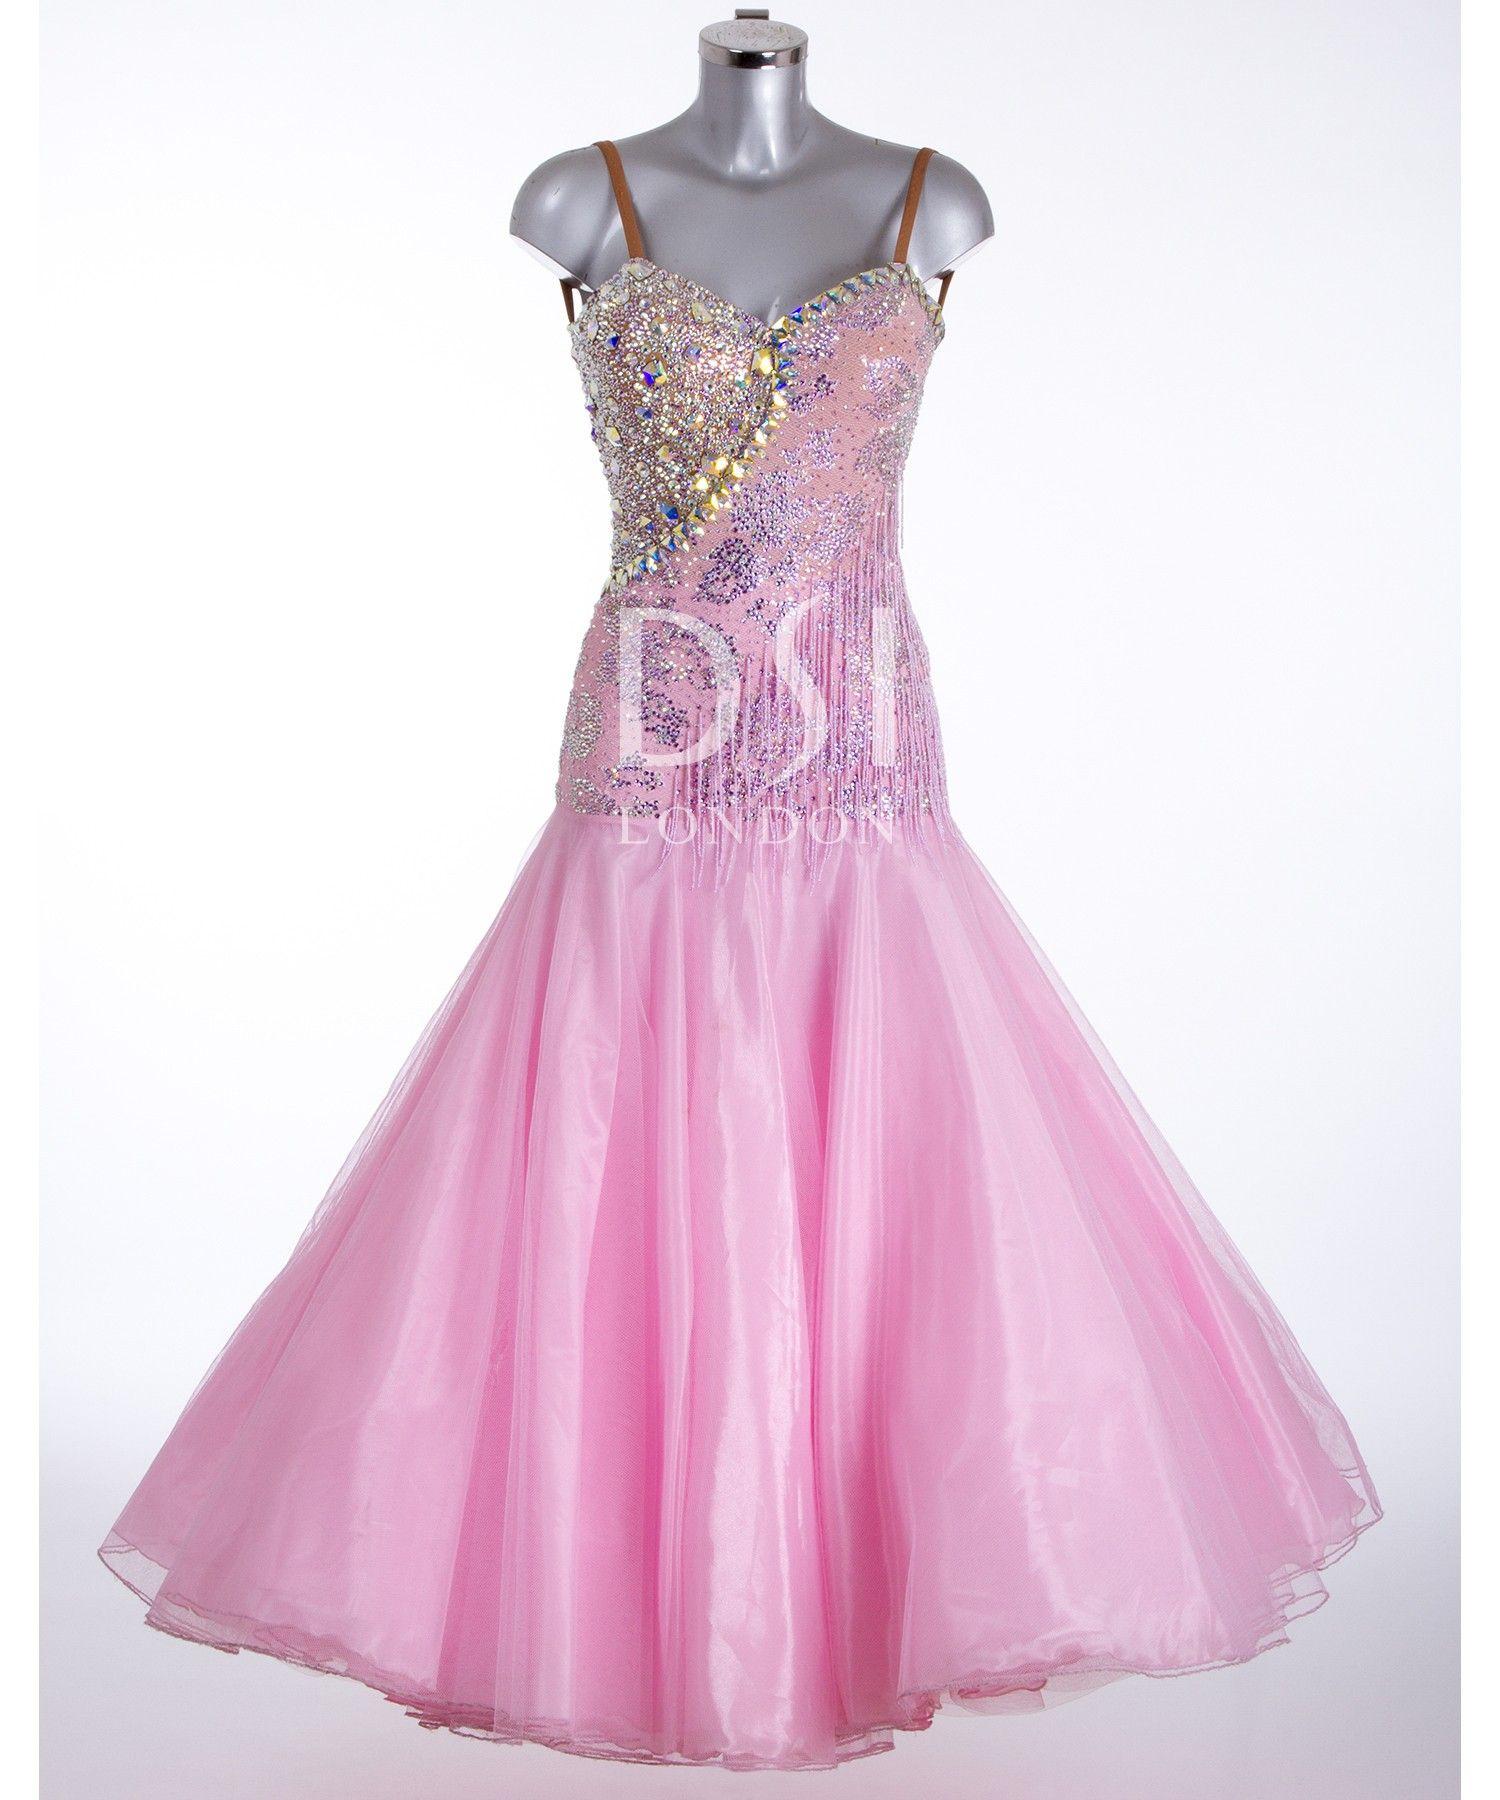 373679 Rse Pink Ballroom Dress | Ballroom dresses for sale ...